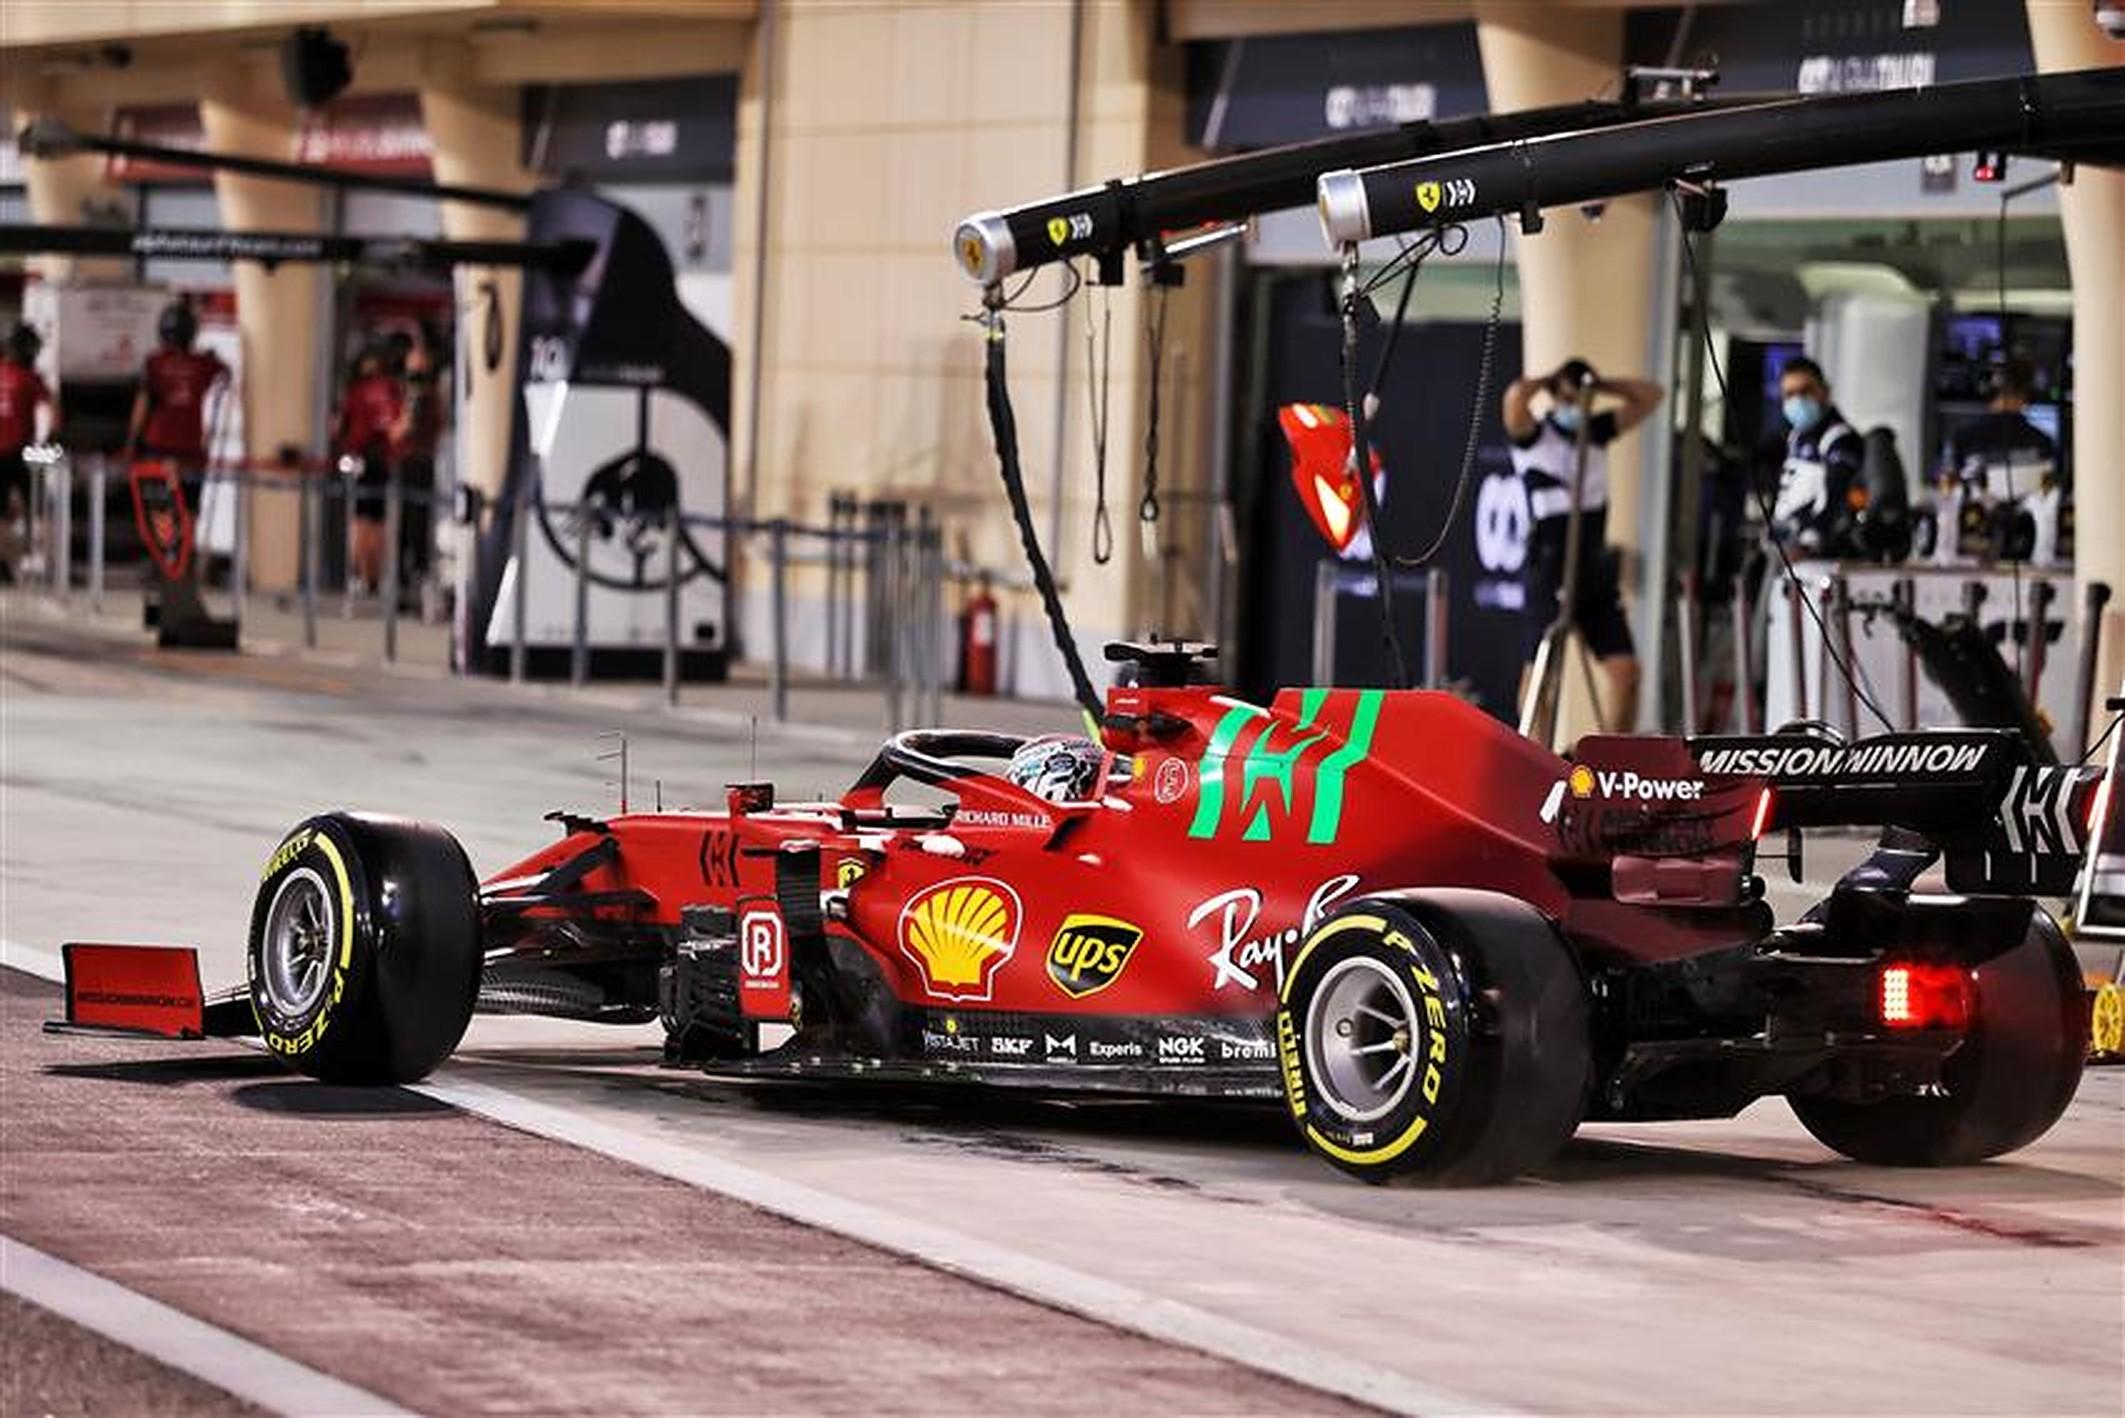 Charles Leclerc in the Ferrari SF21 at Bahrain - Formula1news.co.uk